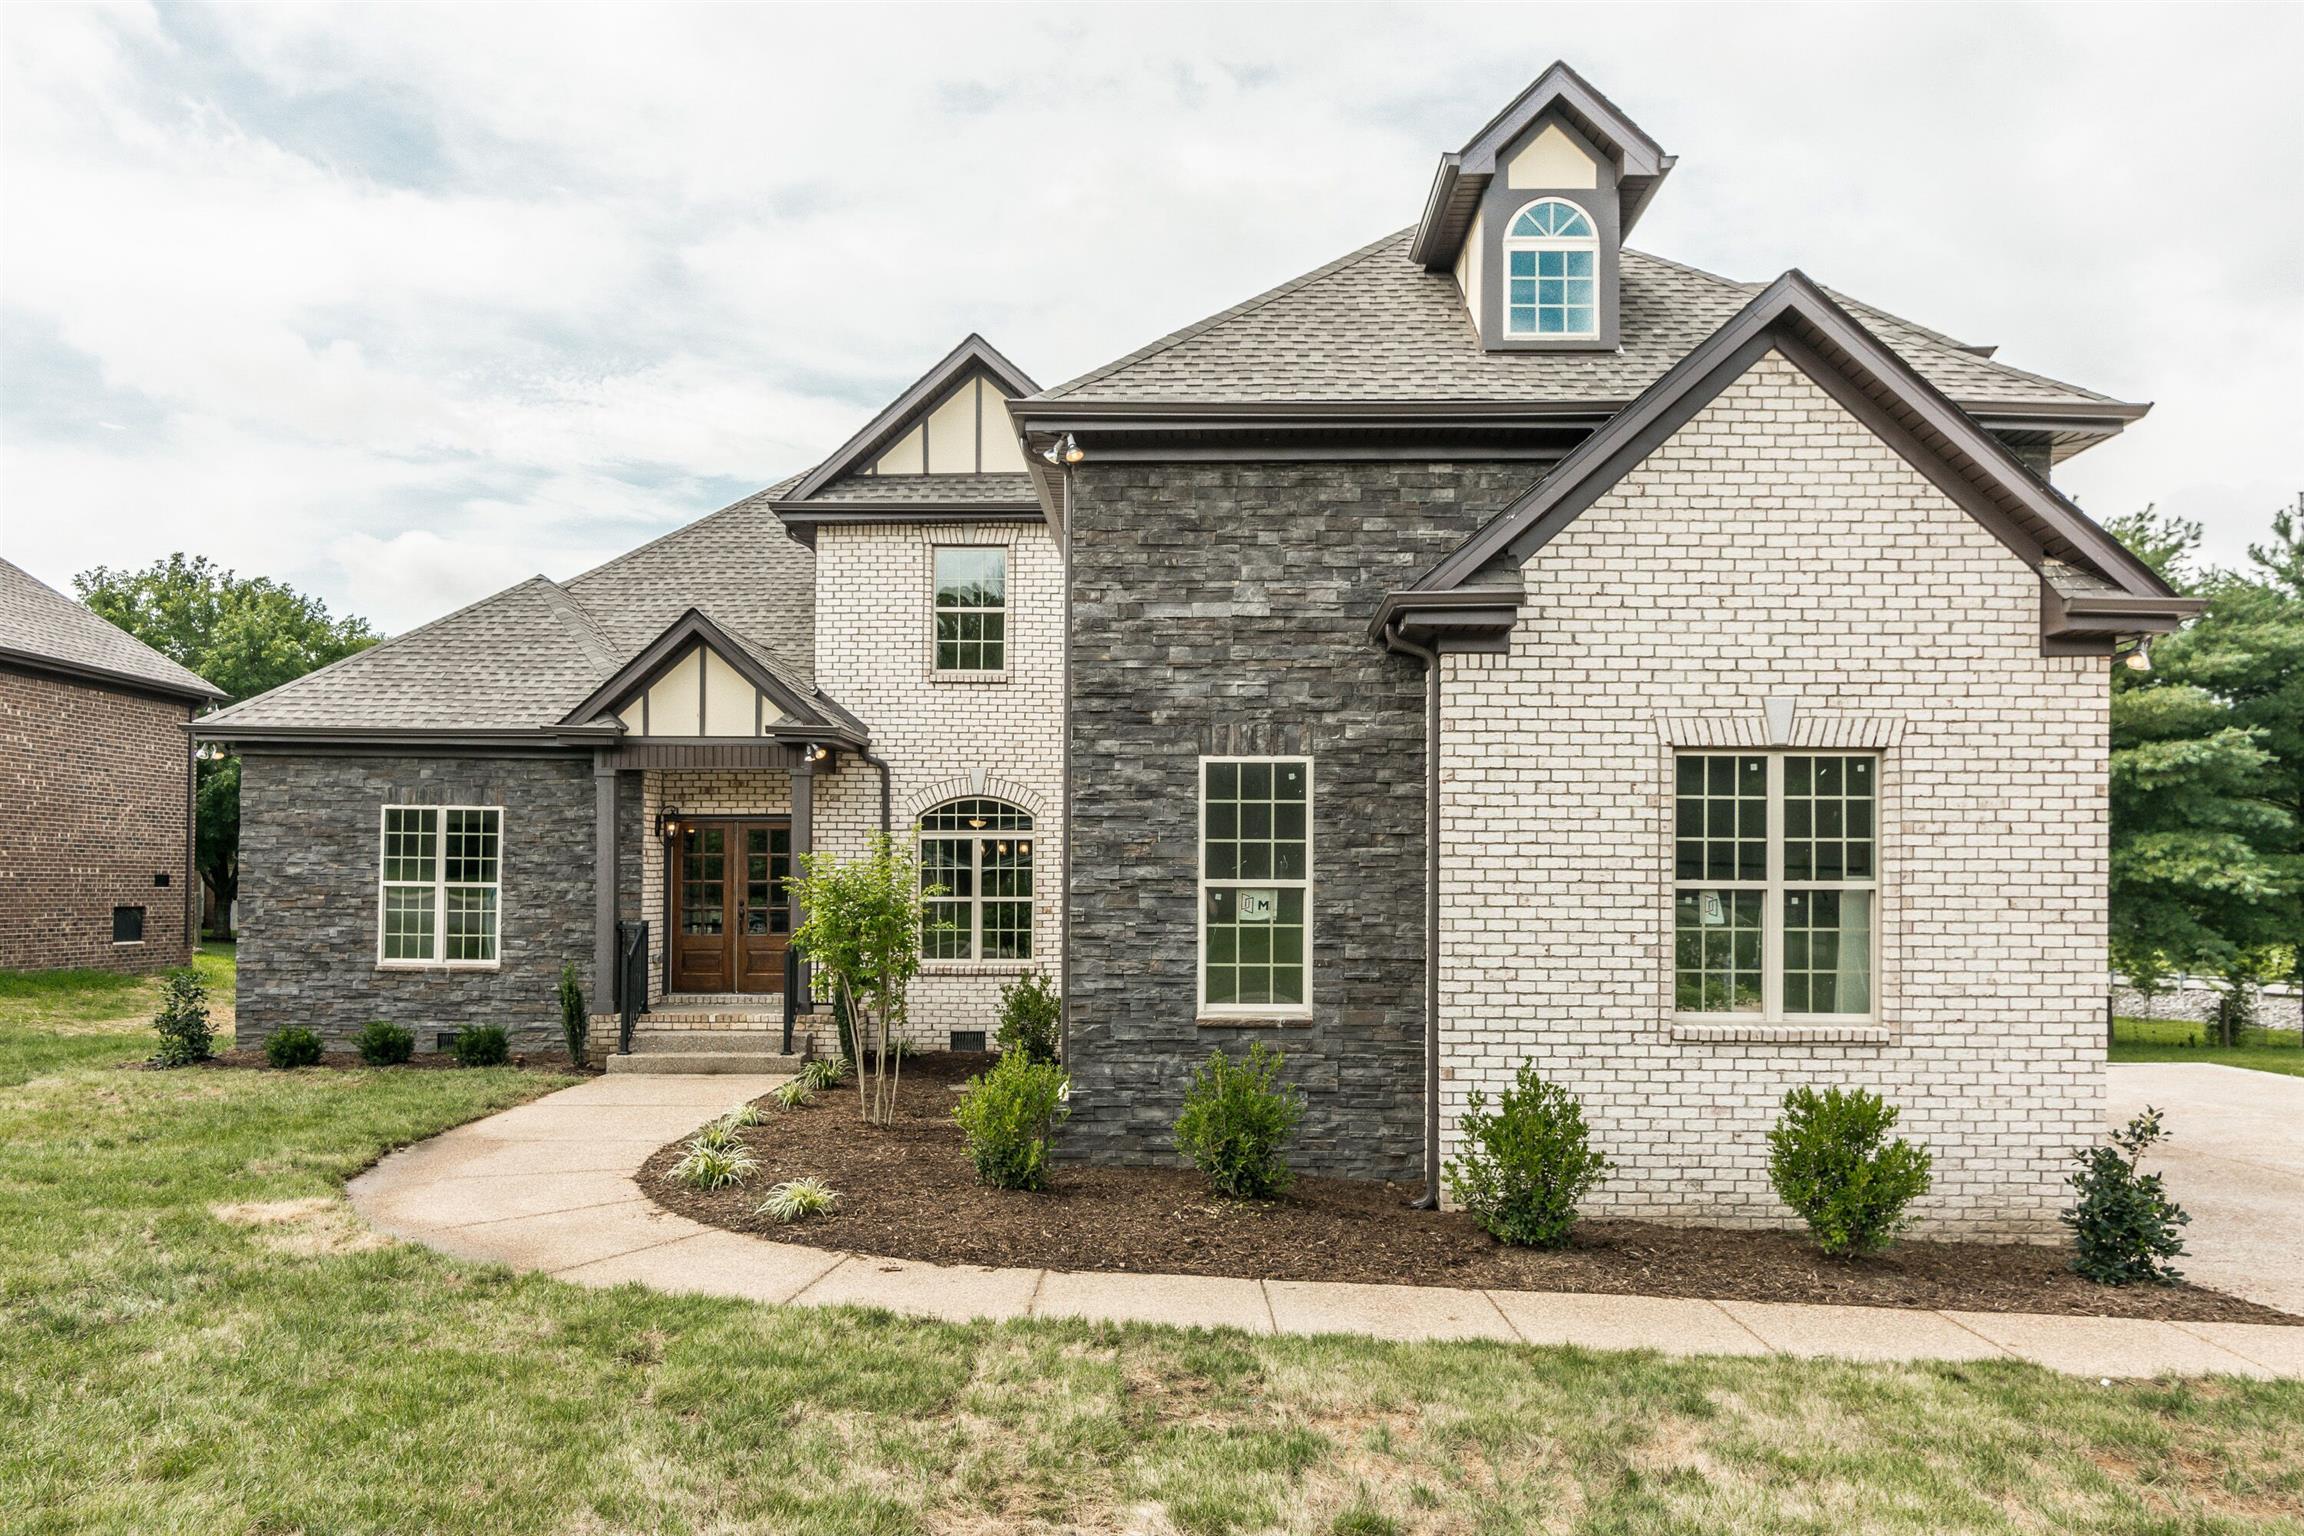 2006 Eagle View Rd, Hendersonville, TN 37075 - Hendersonville, TN real estate listing